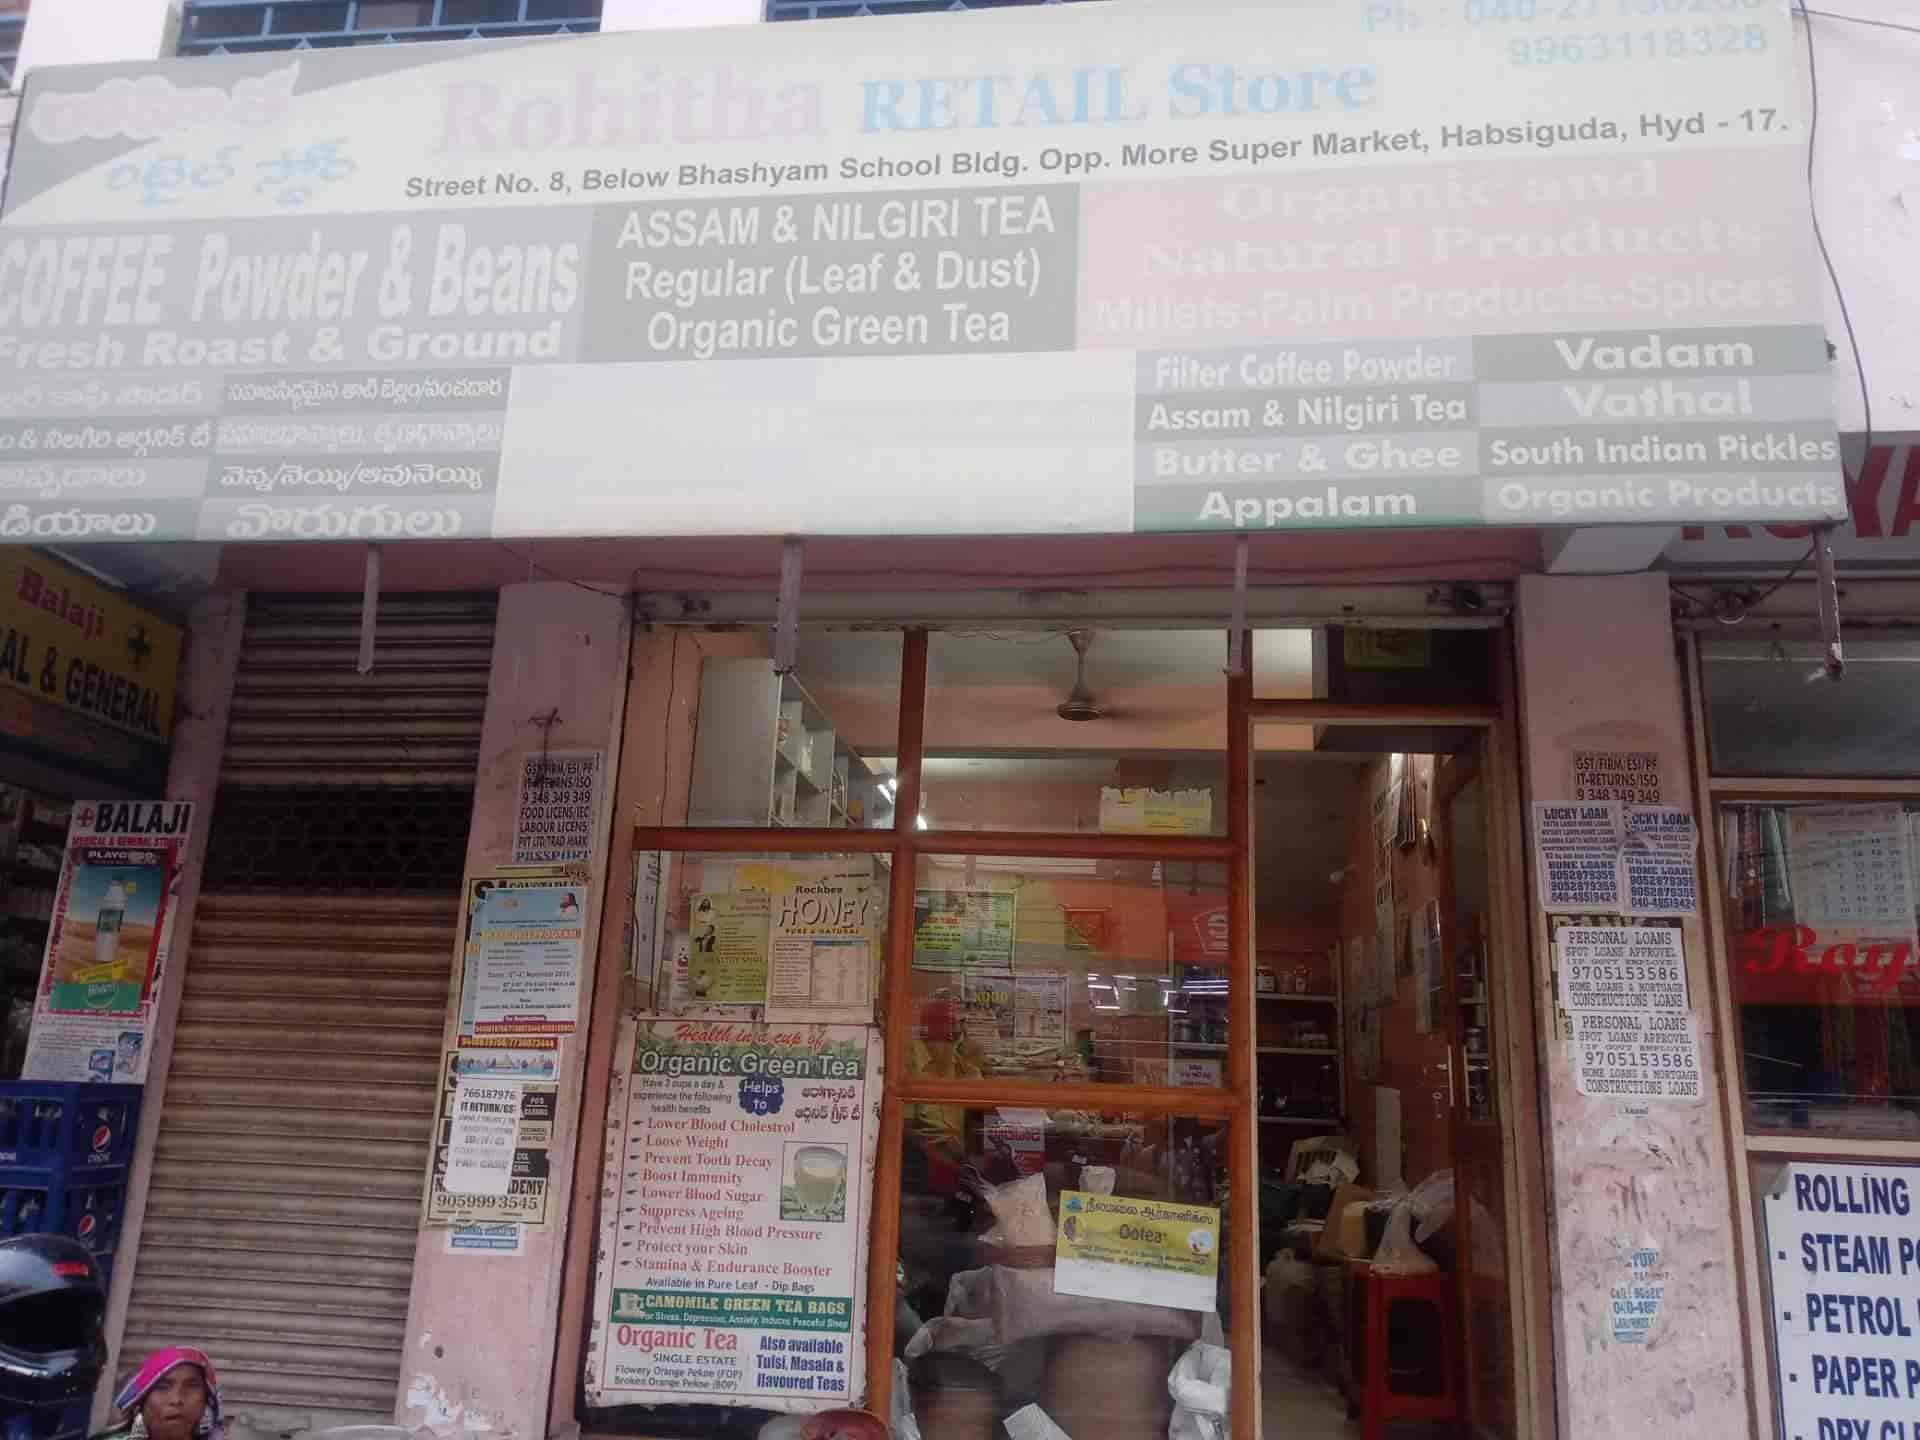 Rohita Retail Store, Habsiguda - Grocery Stores in Hyderabad